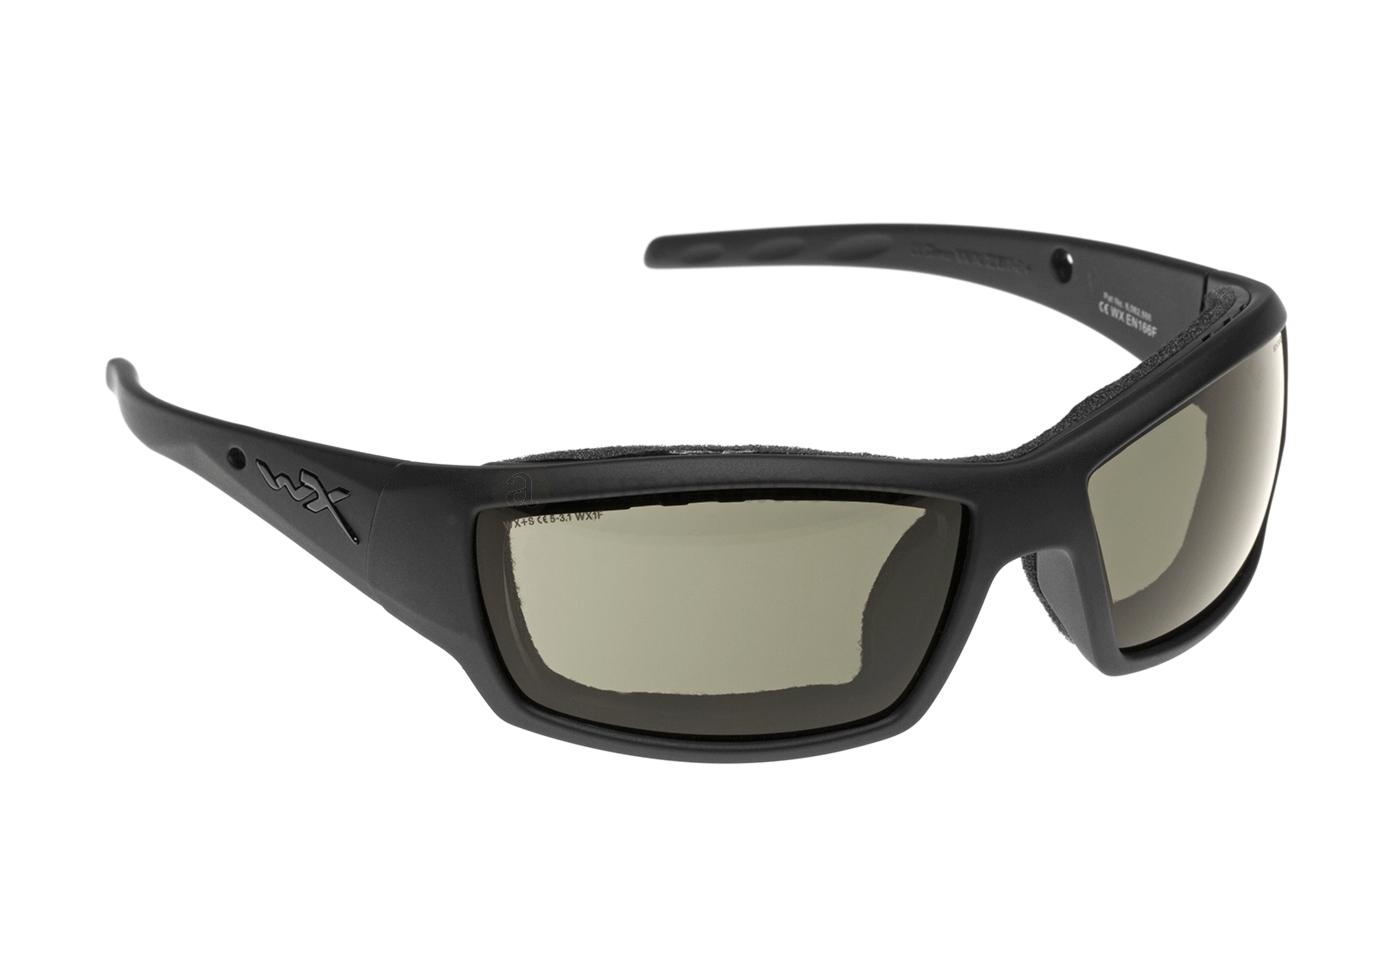 7d00499bcaa Black Ops WX Tide Black (Wiley X) - Glasses - Eyewear .